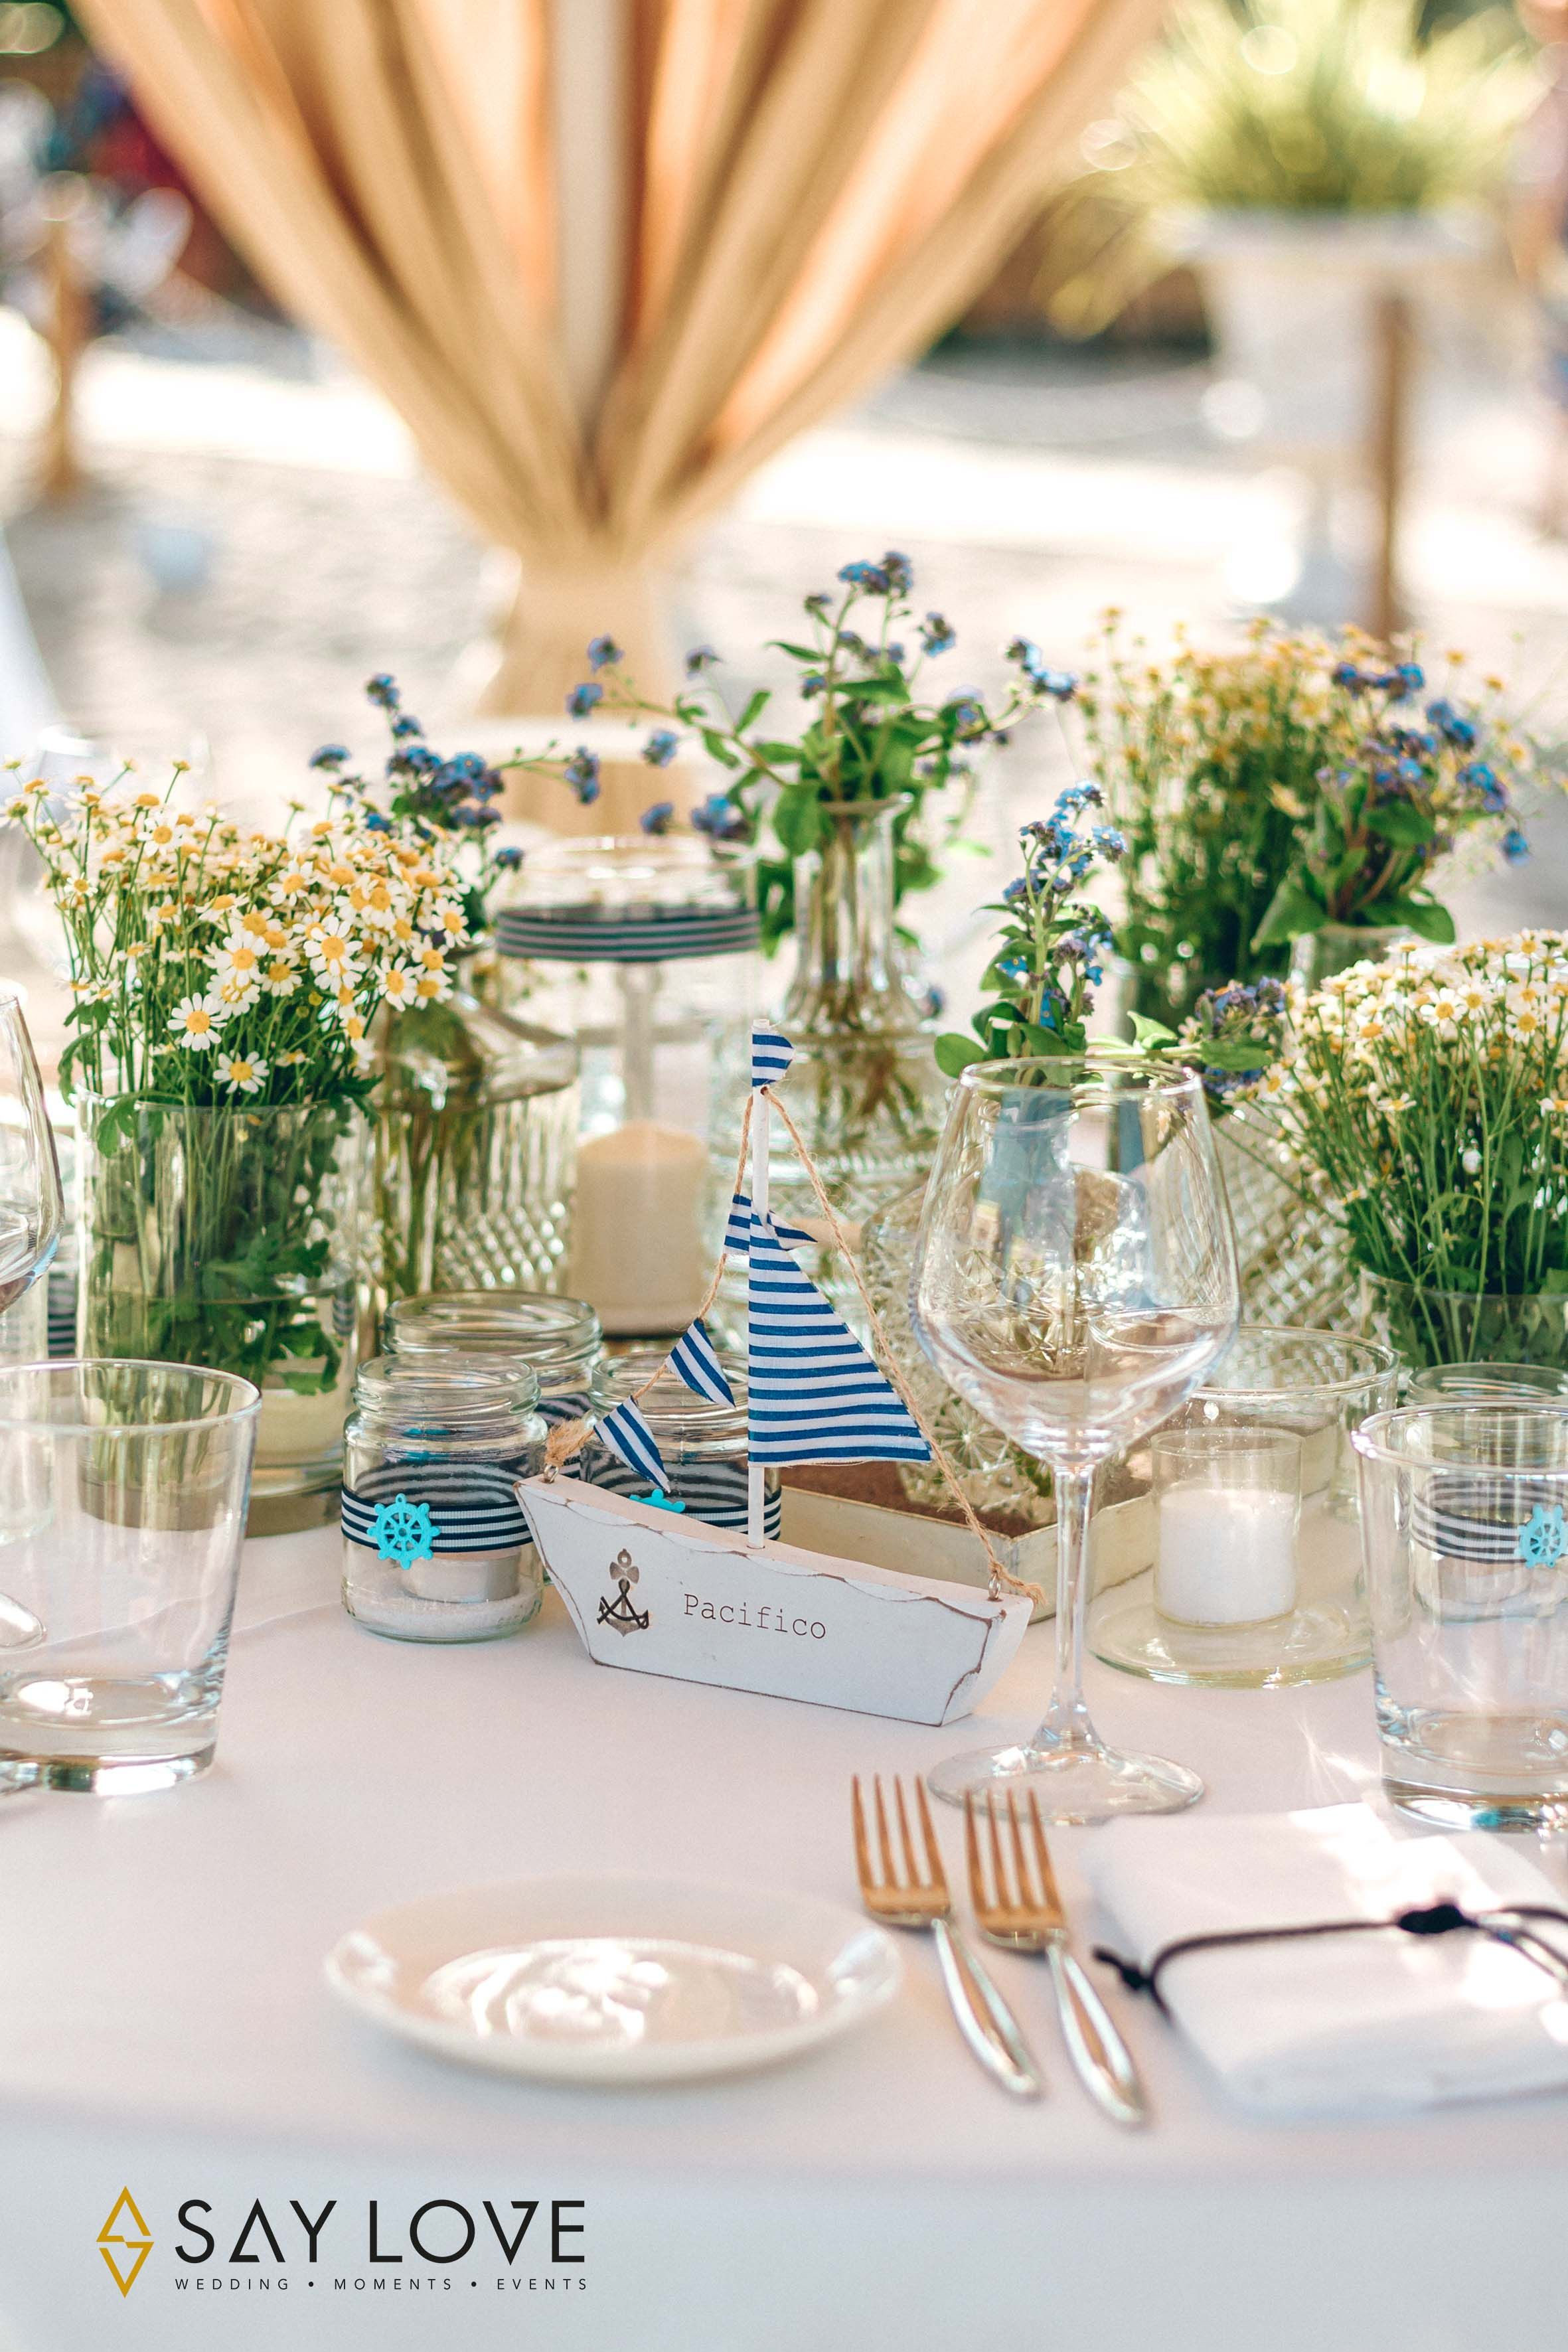 Allestimento Tavolo Wedding Wedding Planner Planner Tavolo